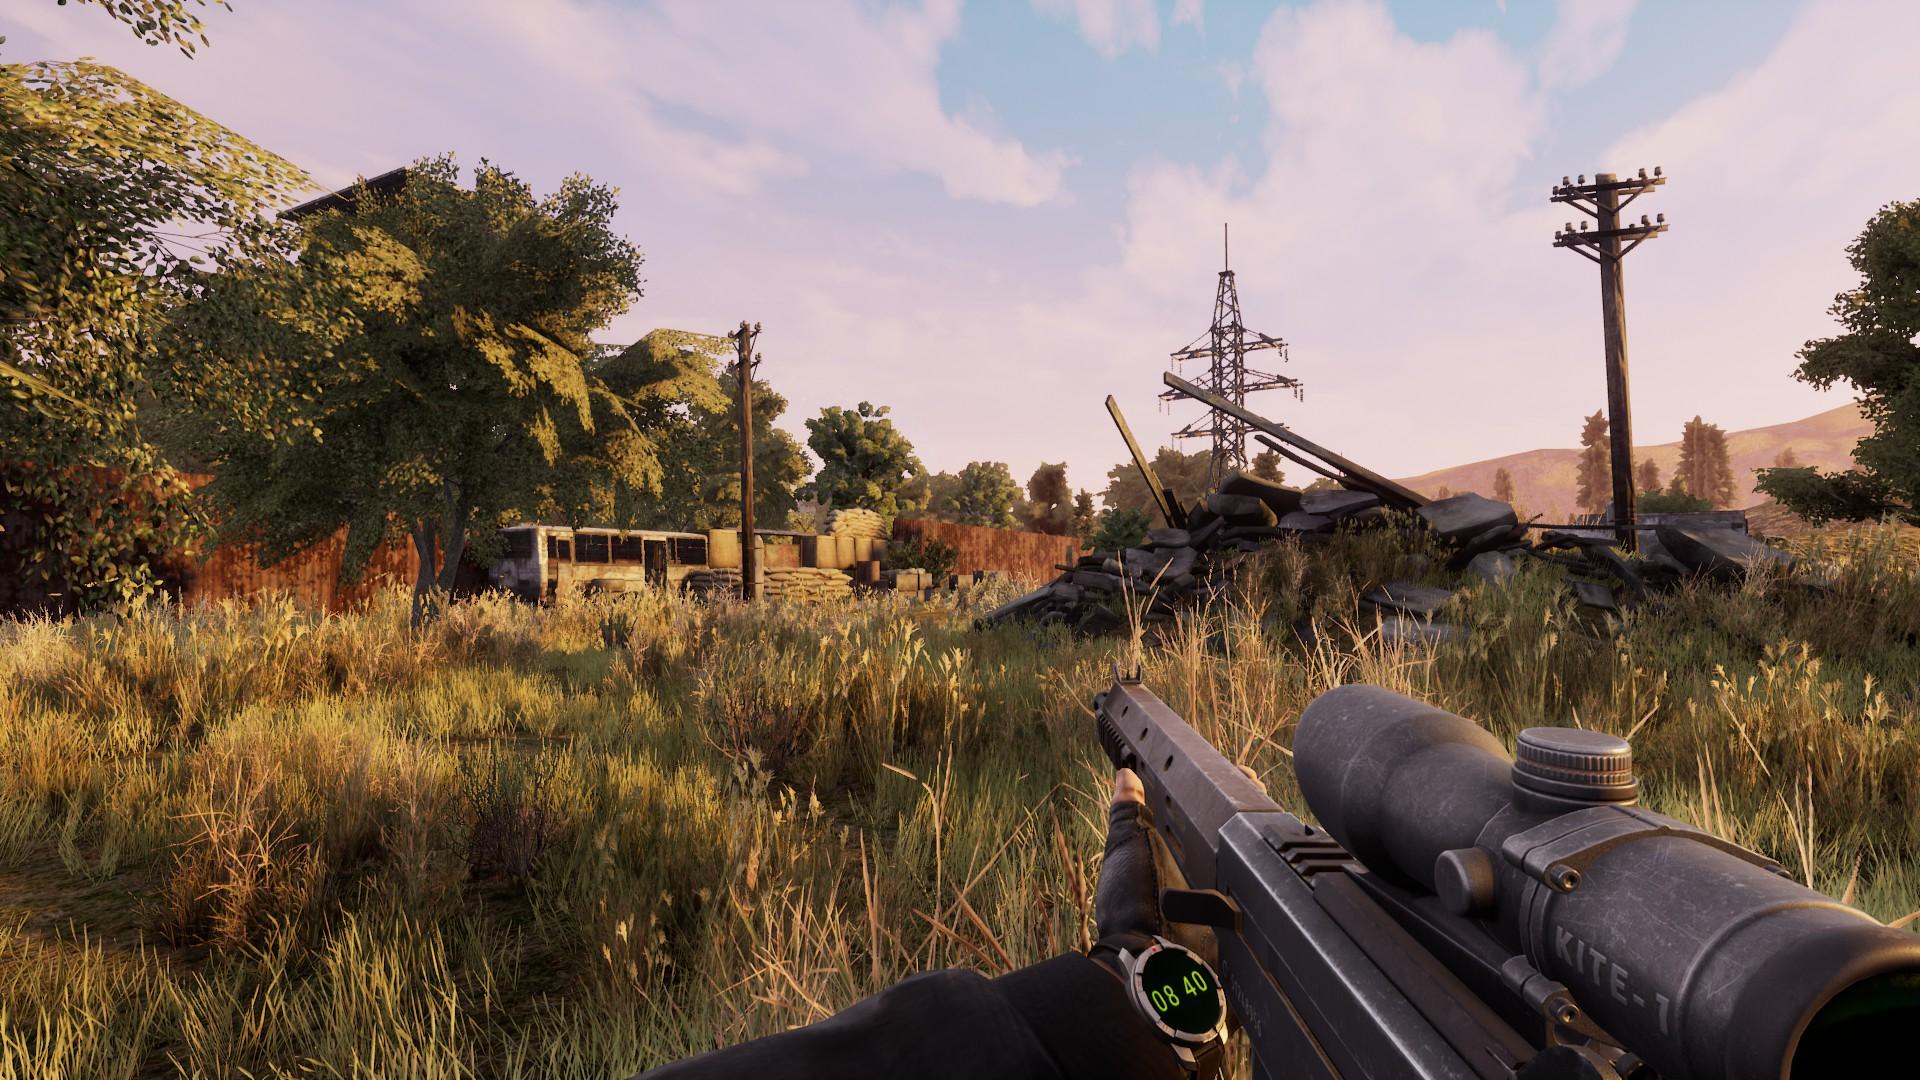 Особенности разработки MMO на Unreal Engine - UE4 Daily